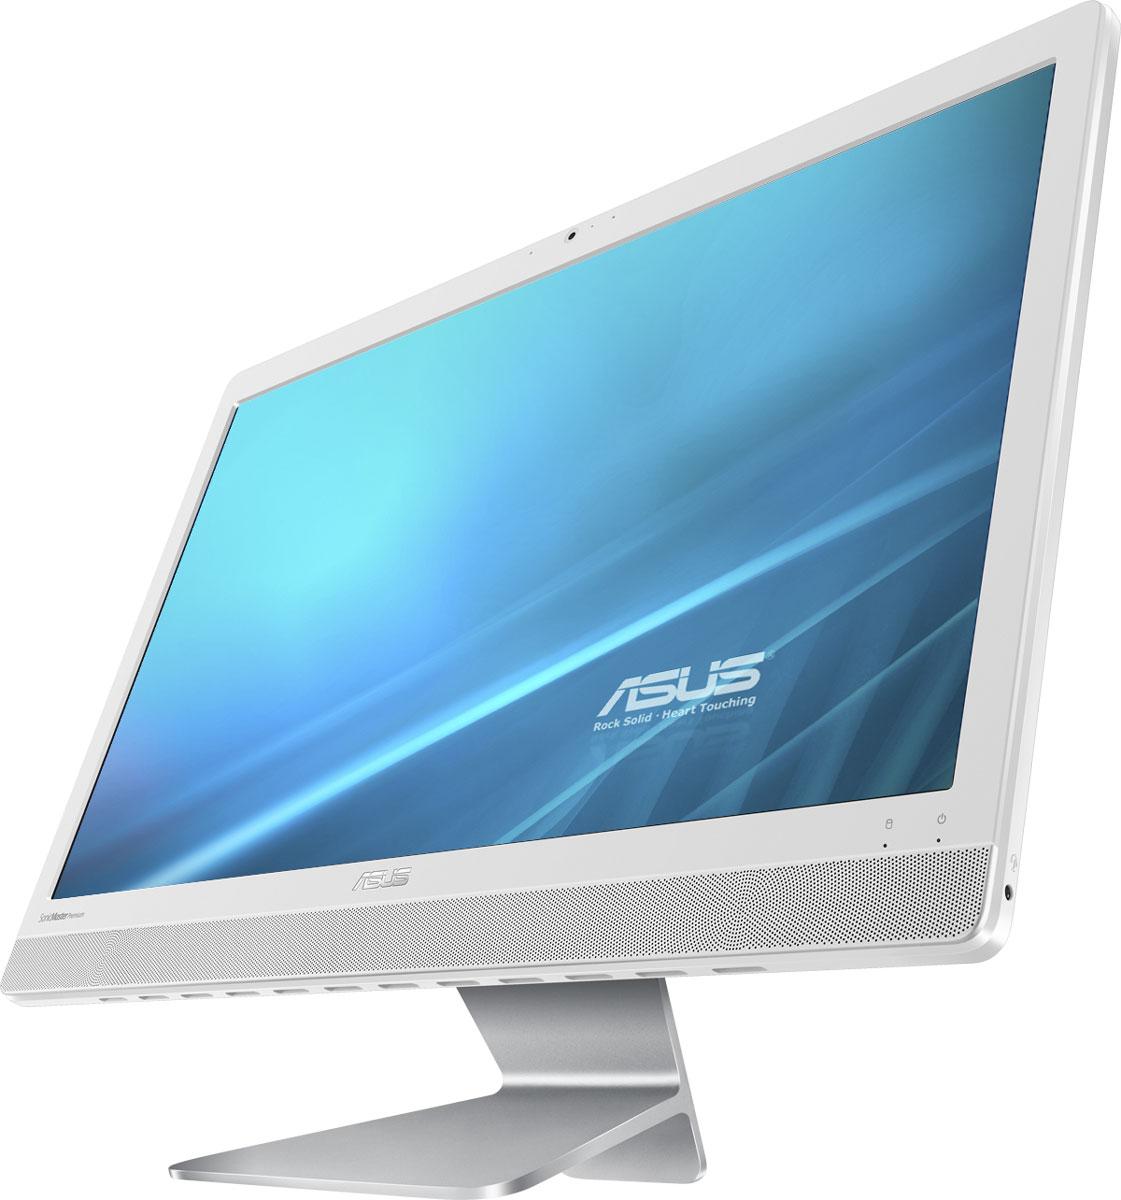 ASUS Vivo AiO V221IDUK-WA013D, White моноблок - Настольные компьютеры и моноблоки